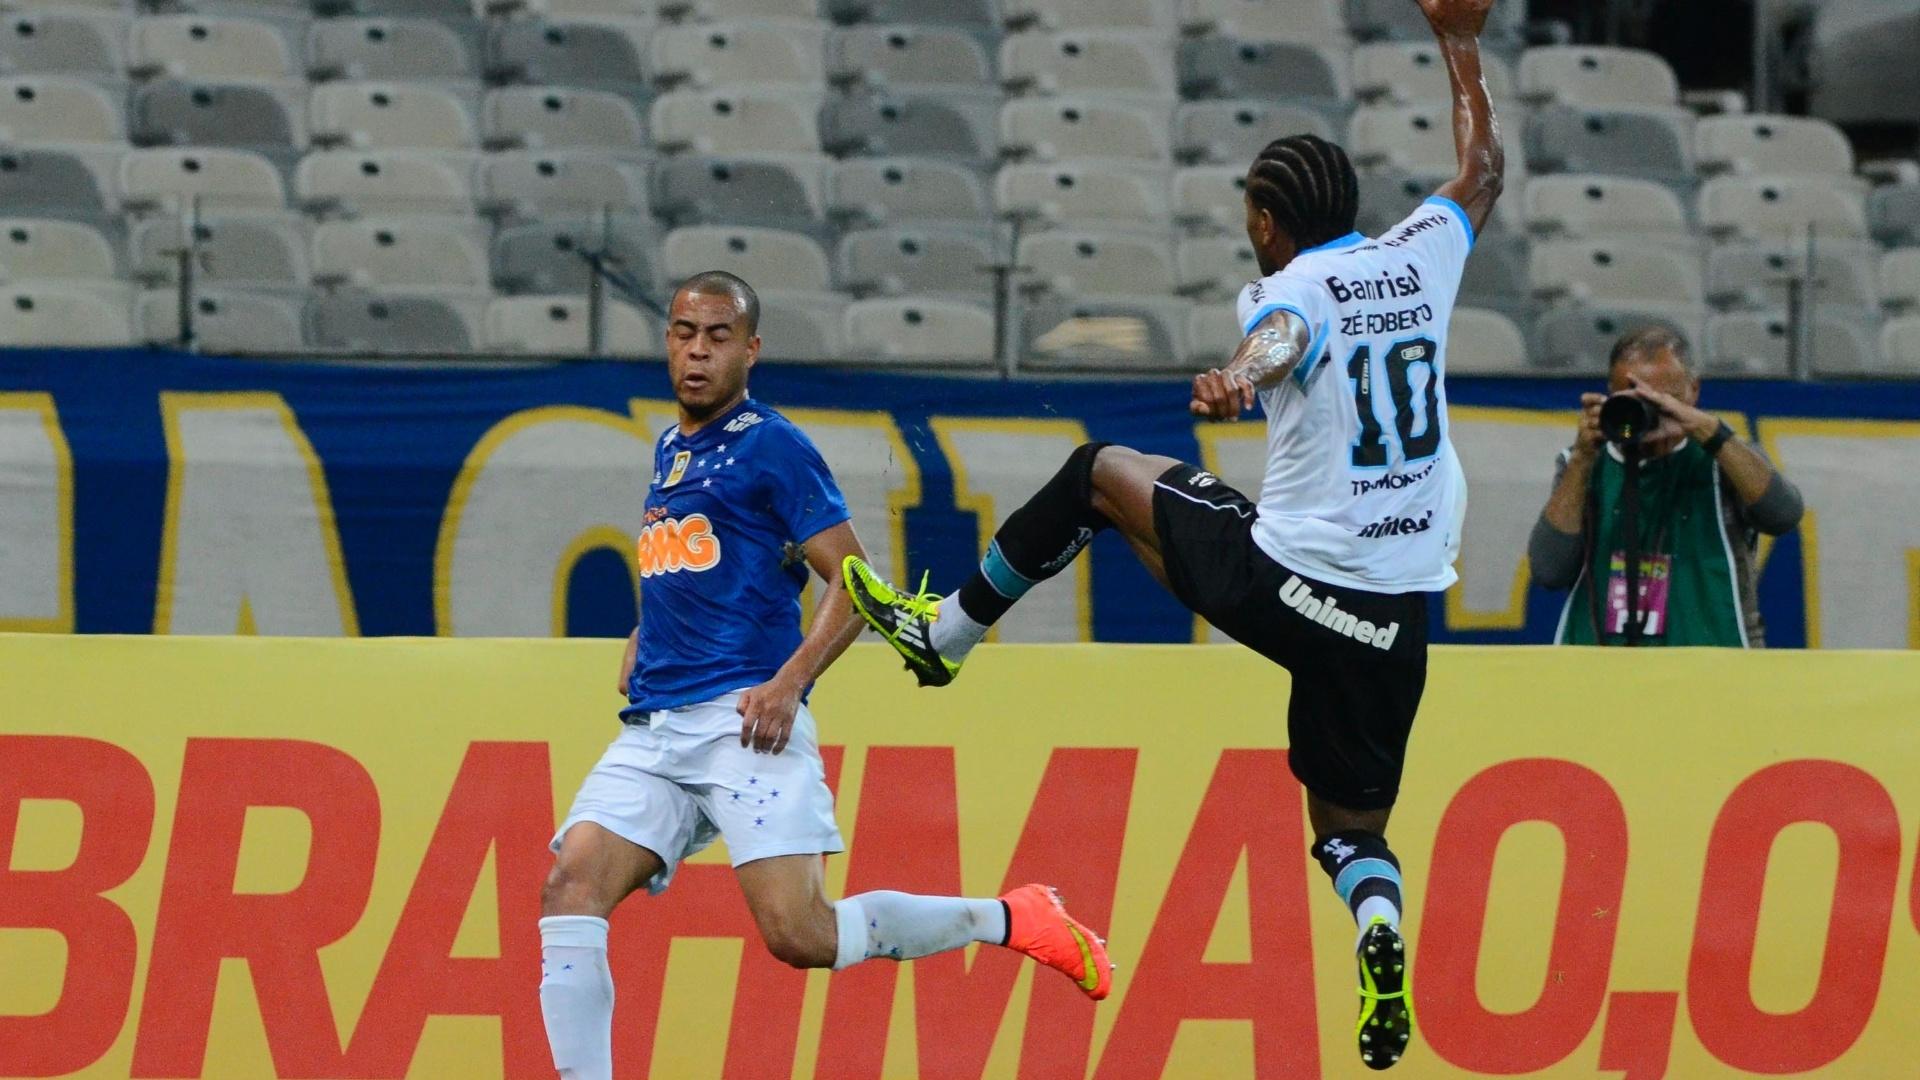 Zé Roberto, do Grêmio, salta para tentar evitar lançamento para Mayke, do Cruzeiro